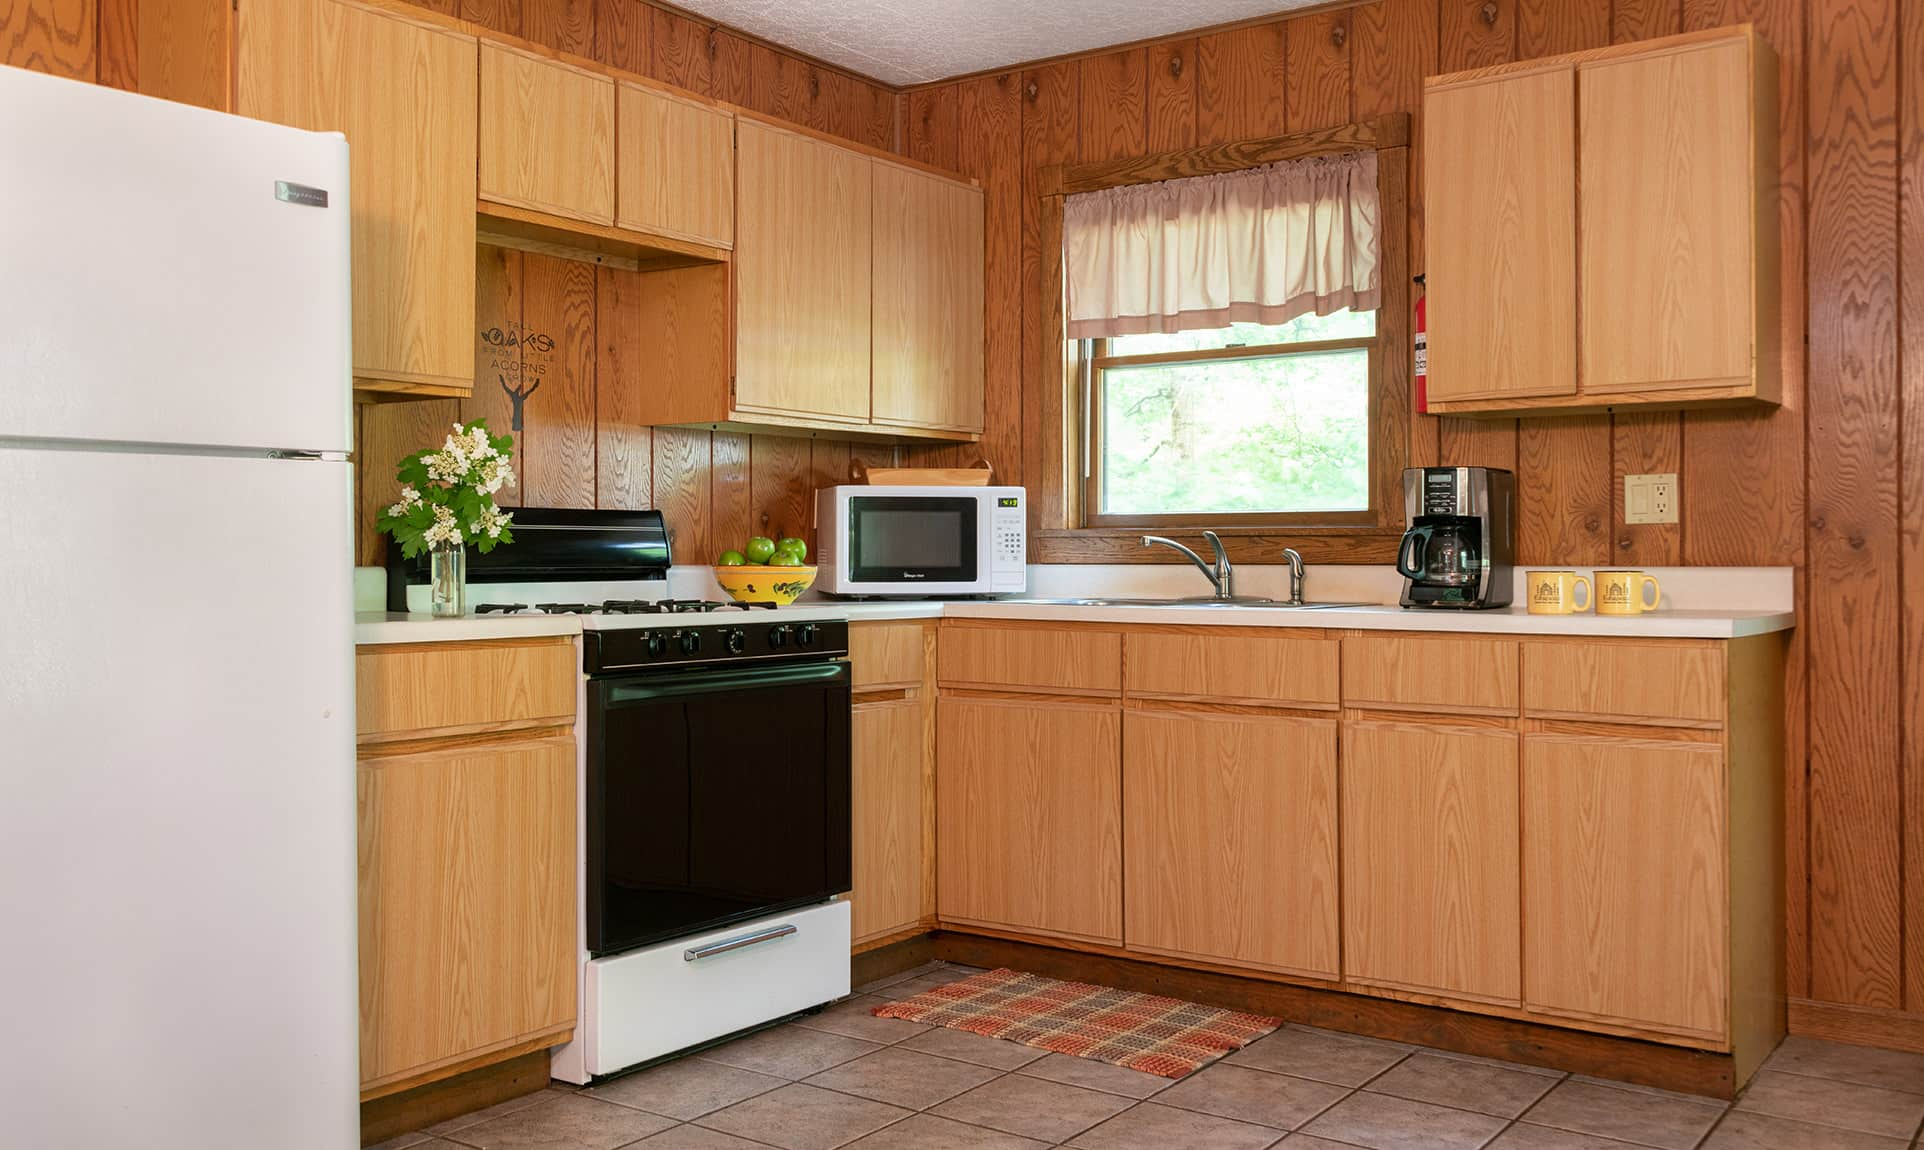 Full kitchen in a romantic Illinois cabin near Starved Rock